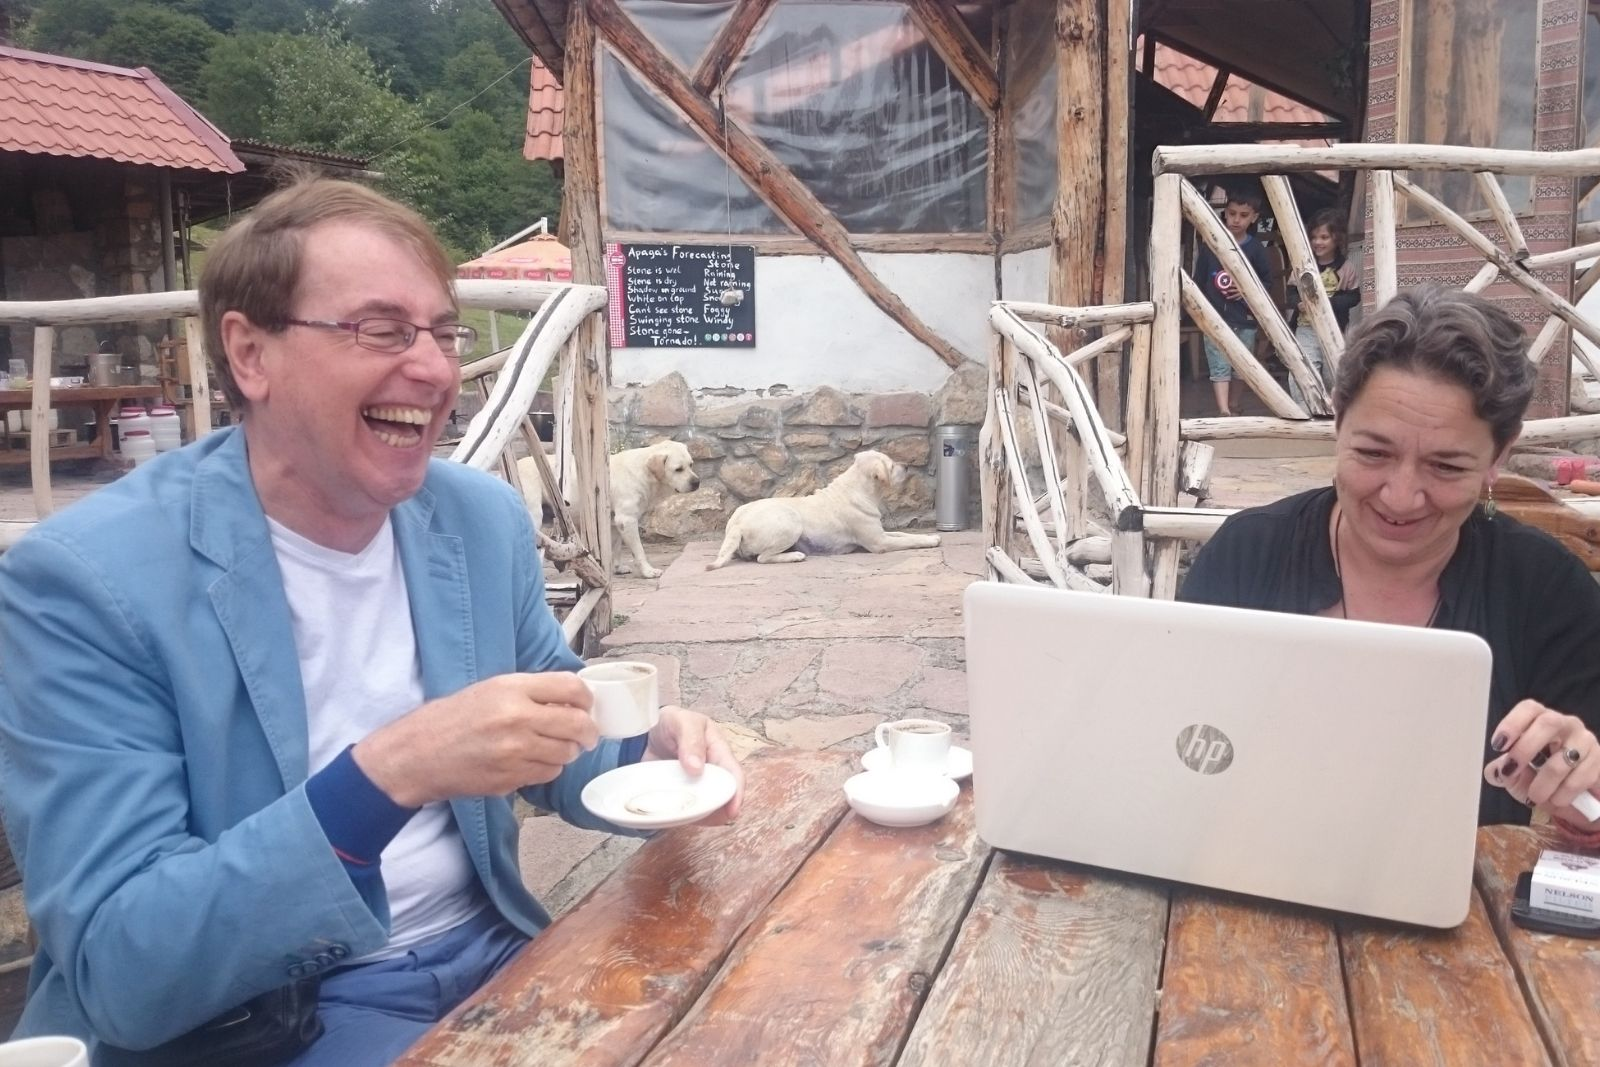 Yana Tchekhanovets and Rene Bekius having coffee break during Armenian language class at Armenian Studies summer school 2015